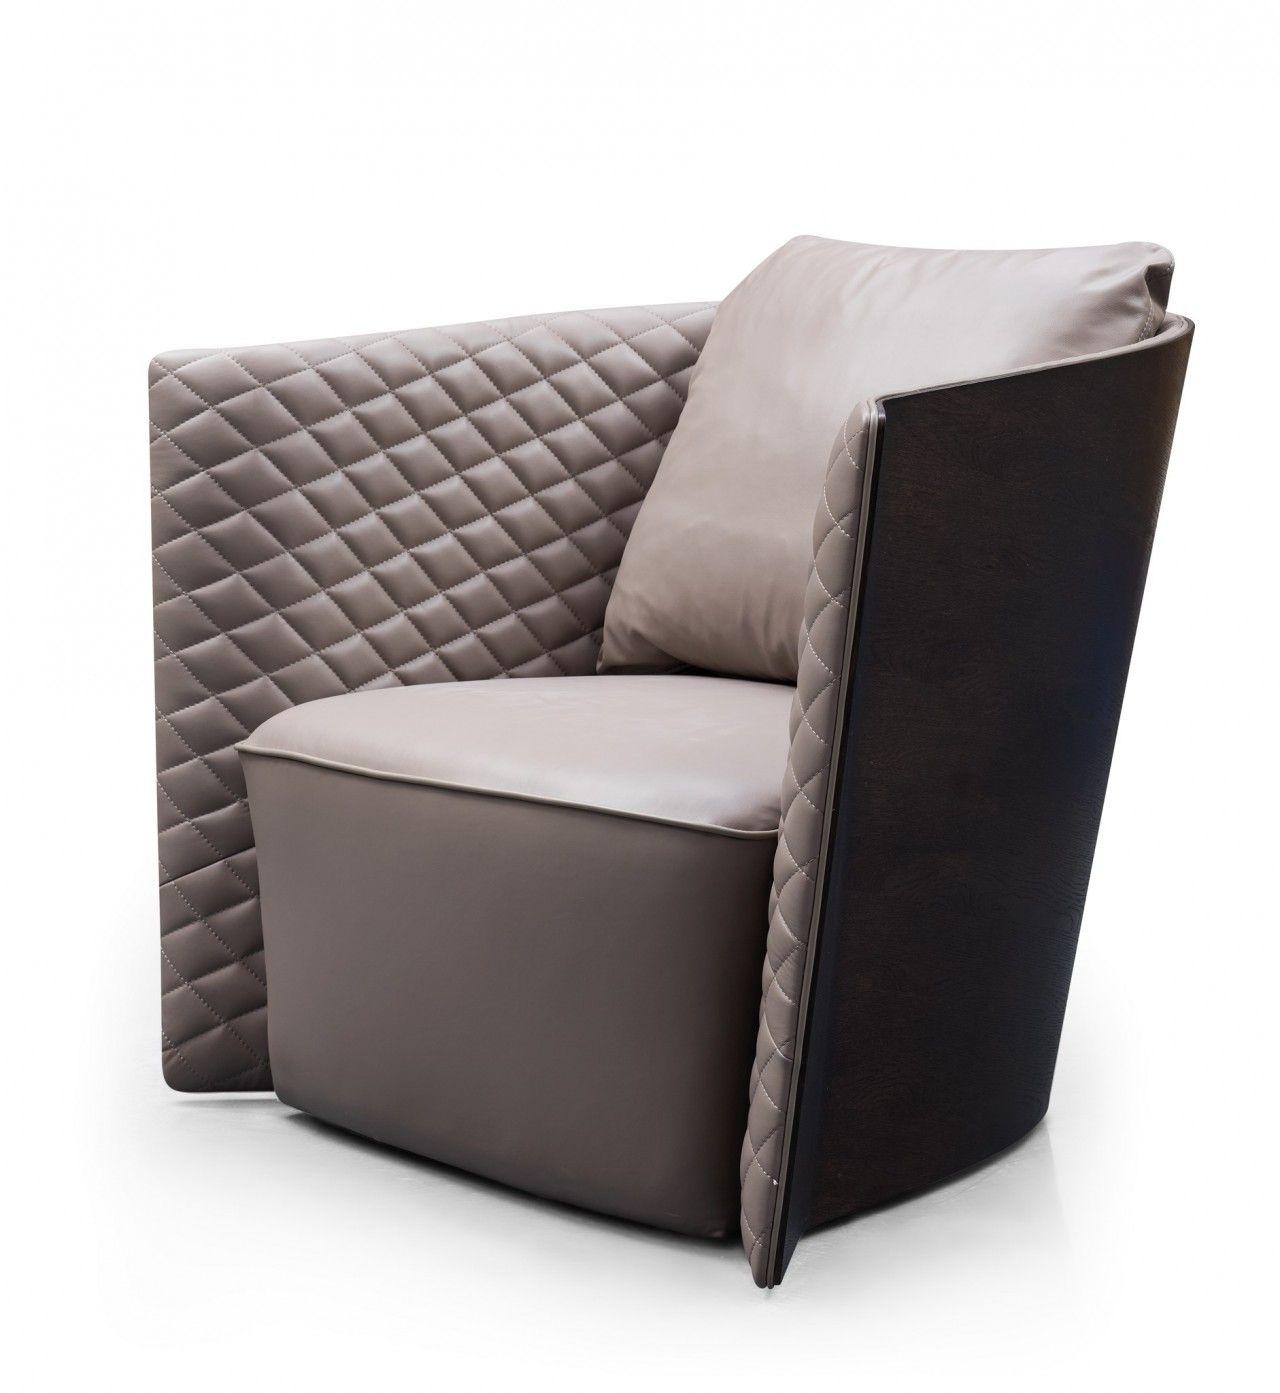 Lauren Chair | Luxury chairs, Armchair furniture, Modern ...